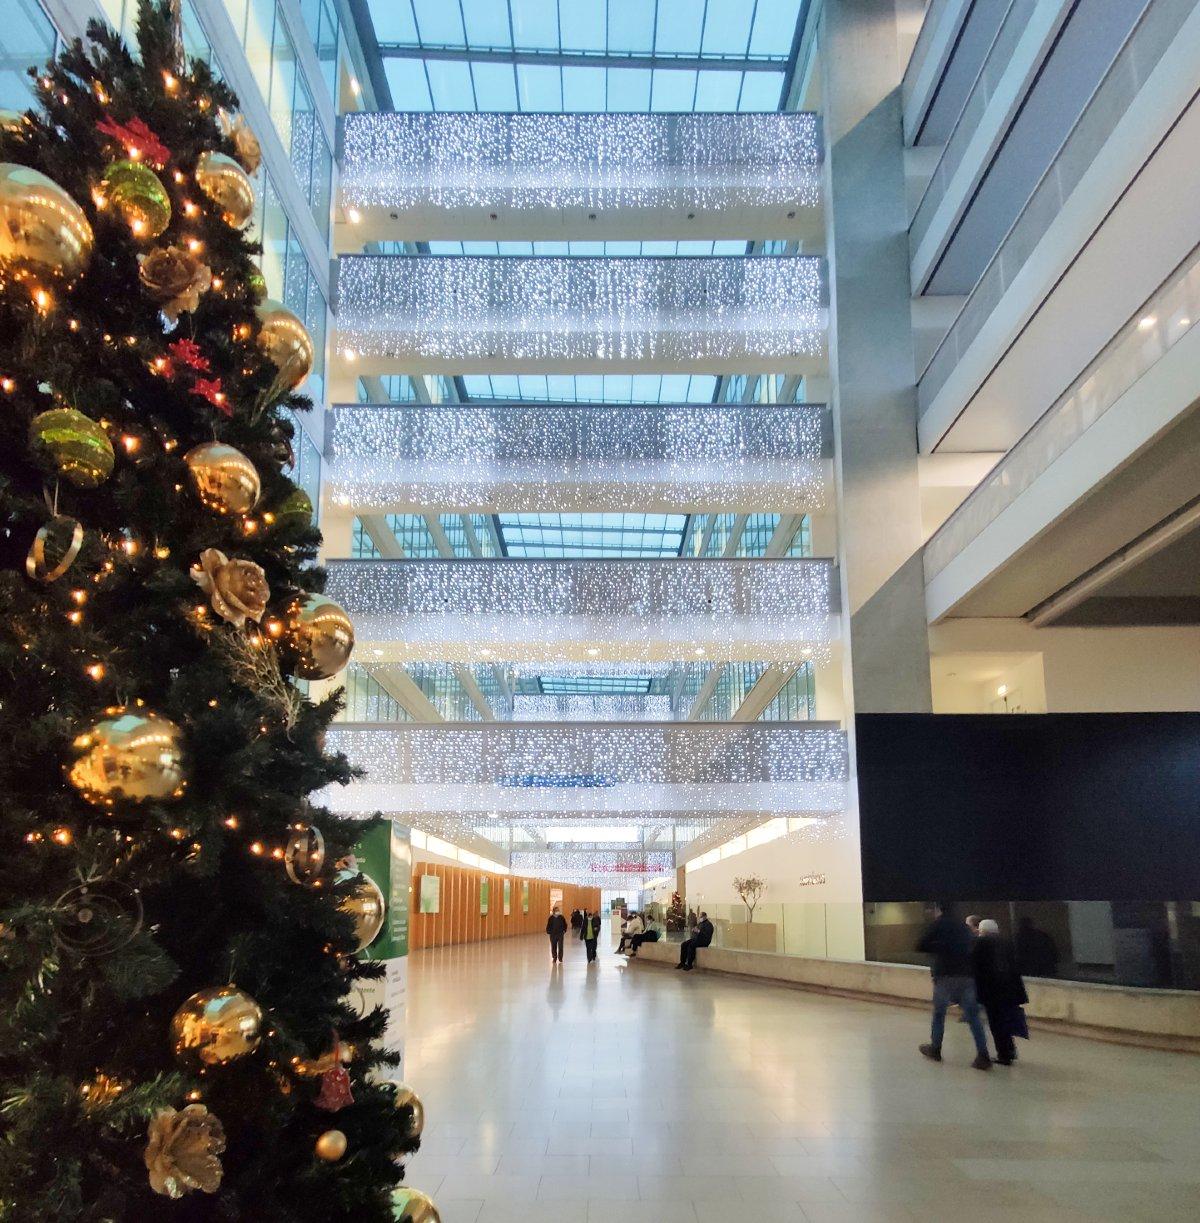 hospital-de-braga-Espírito Natalício chegou ao Hospital de Braga